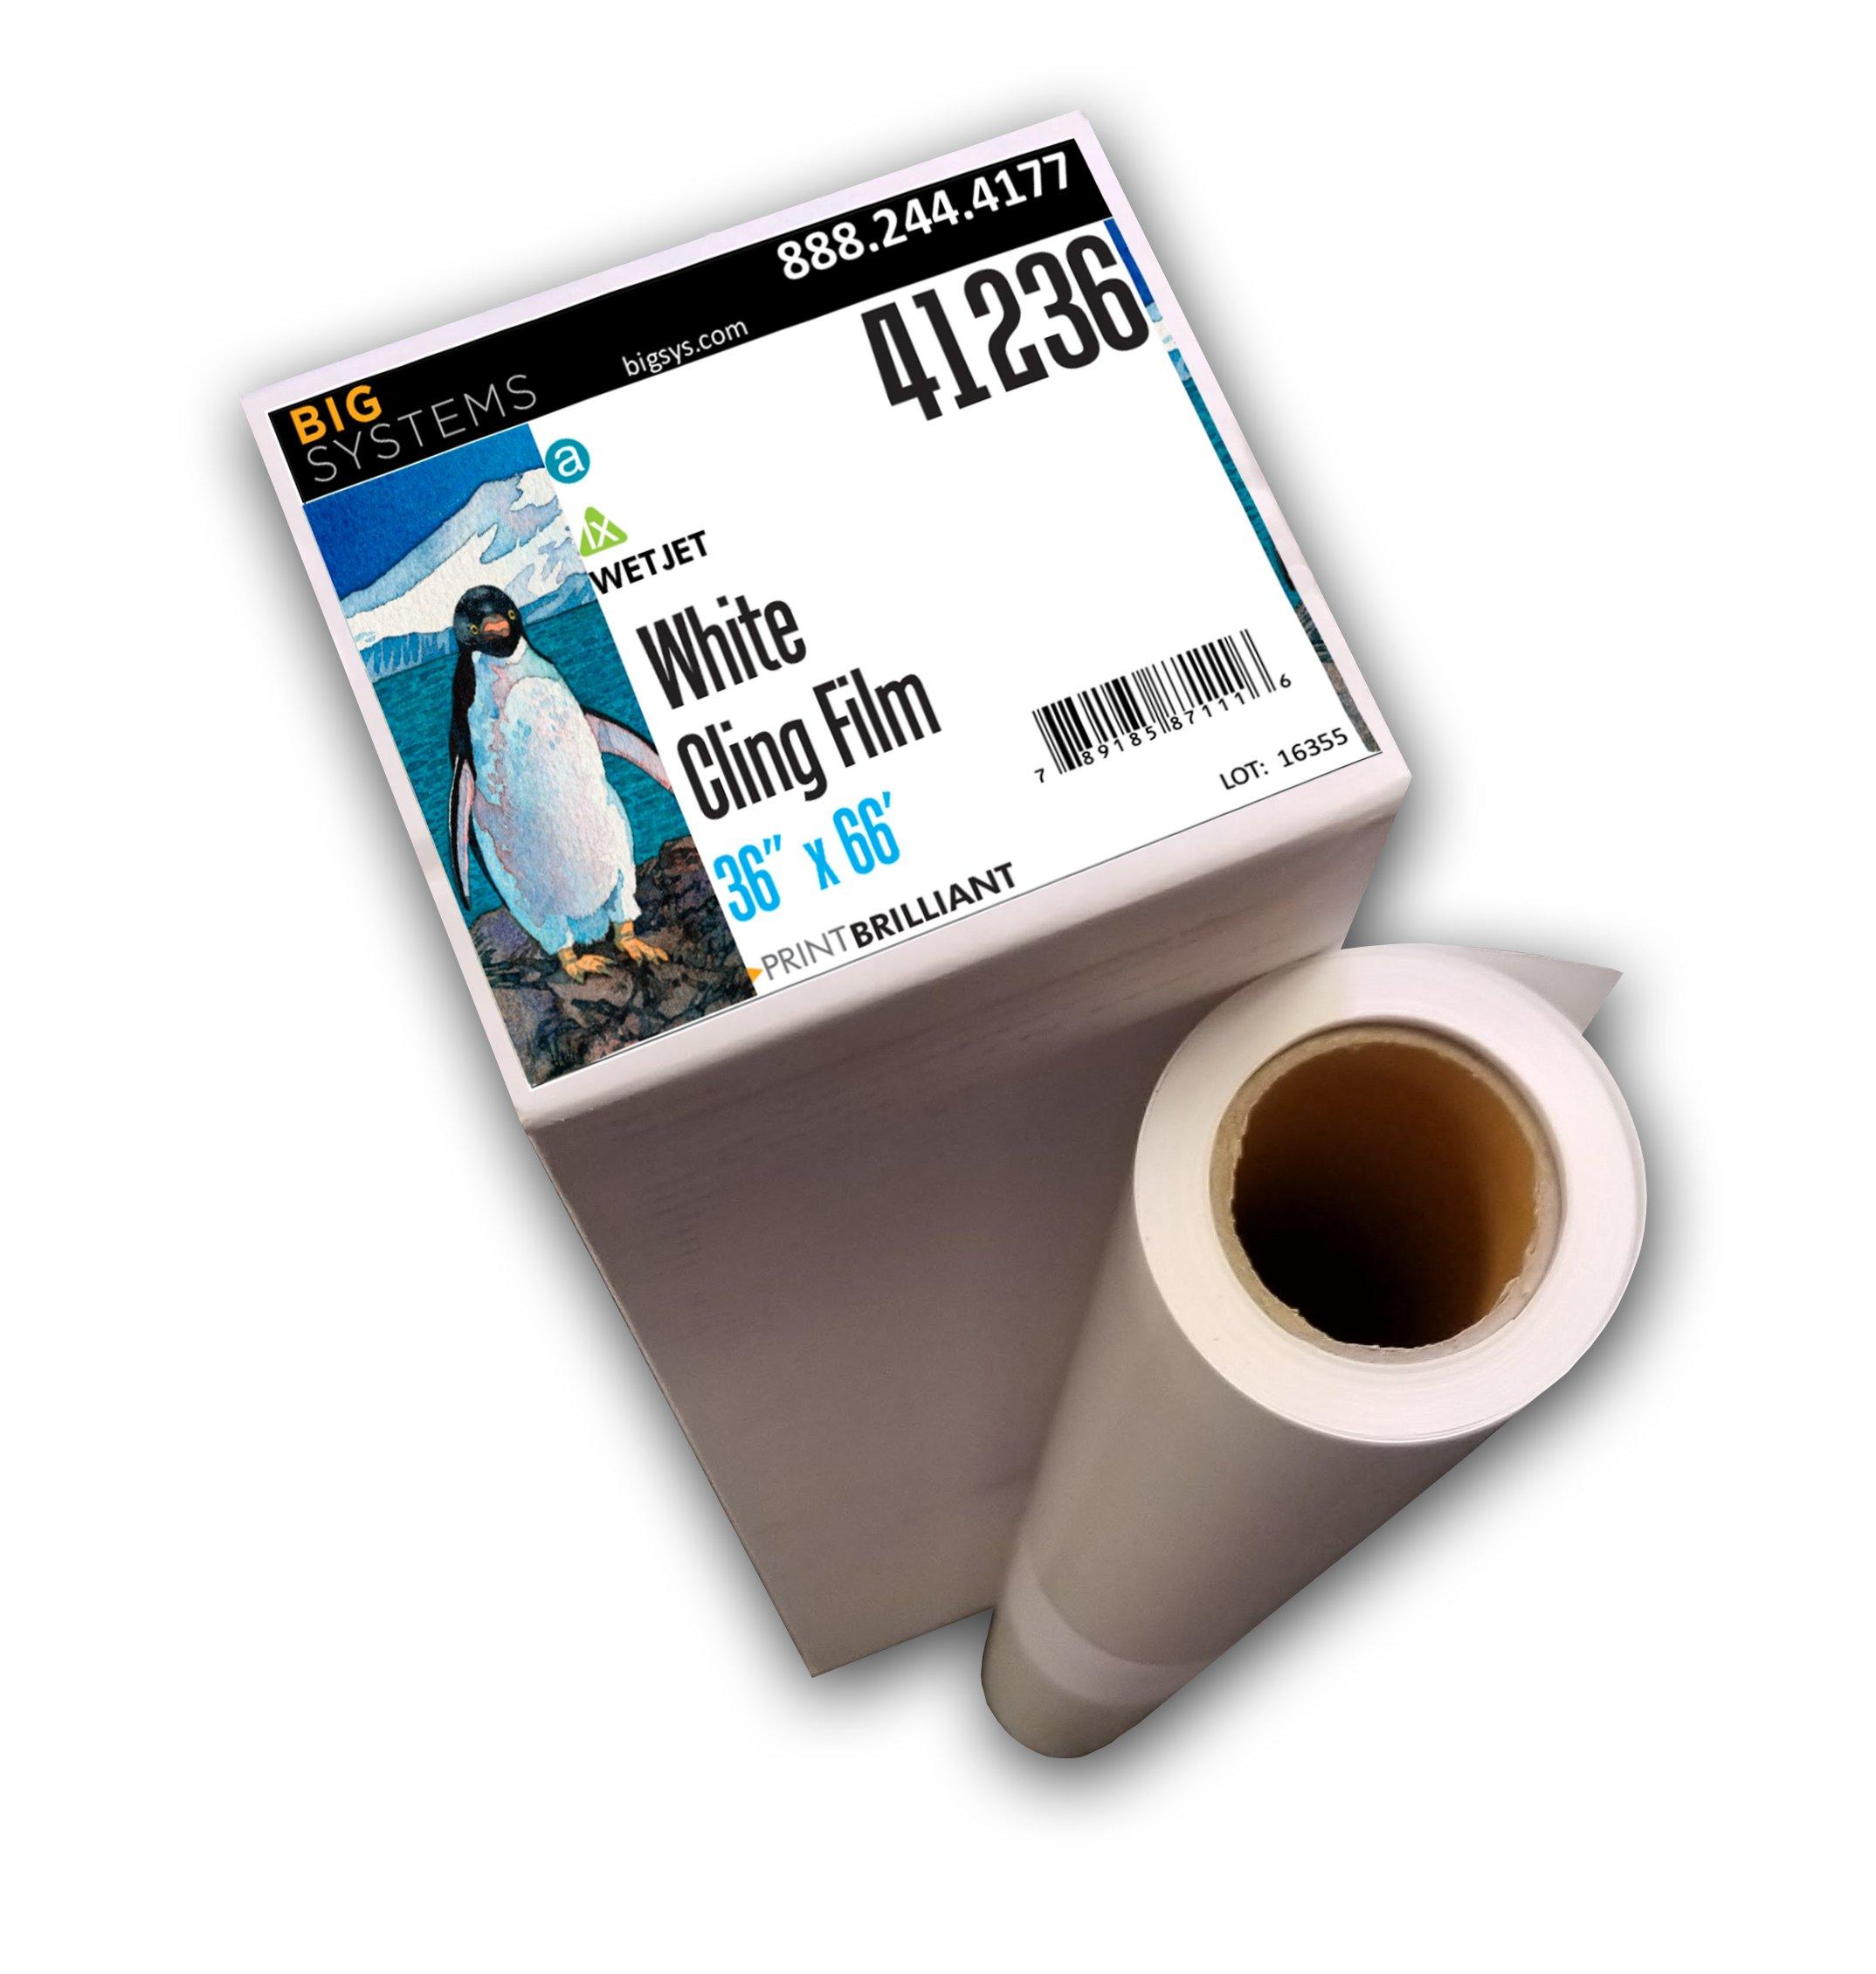 WetJet Aqueous White Cling Film, Banner Paper, Poster Paper Roll (36'' x 66')